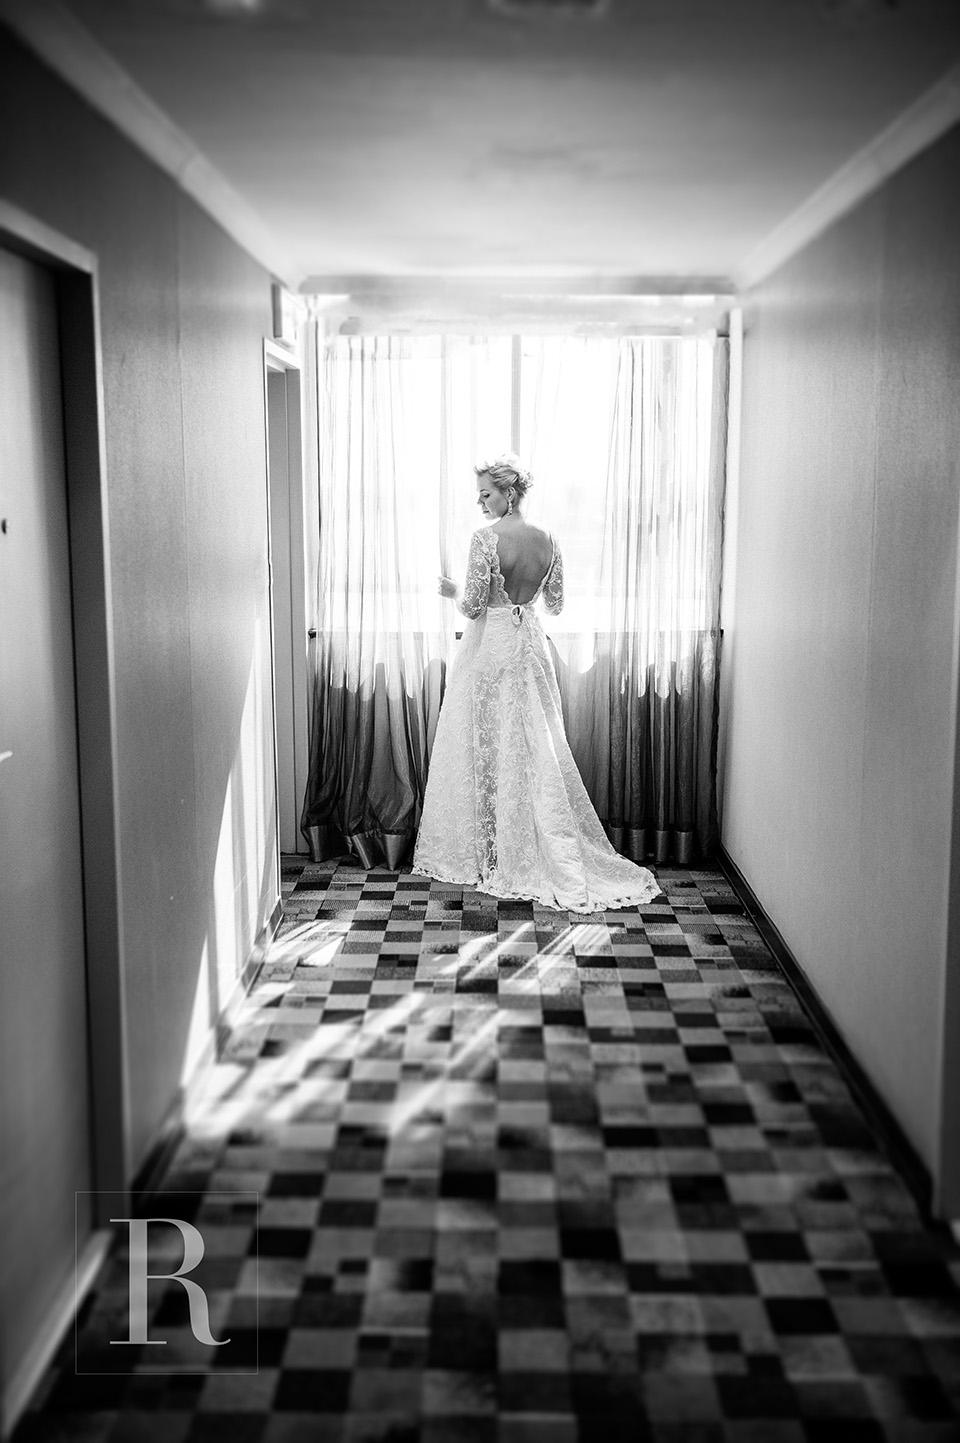 RYAN PARKER PHOTOGRAPHY_WEDDING_JOHANNESBURG_ROWENA & MIGUEL 2014-0448.jpg